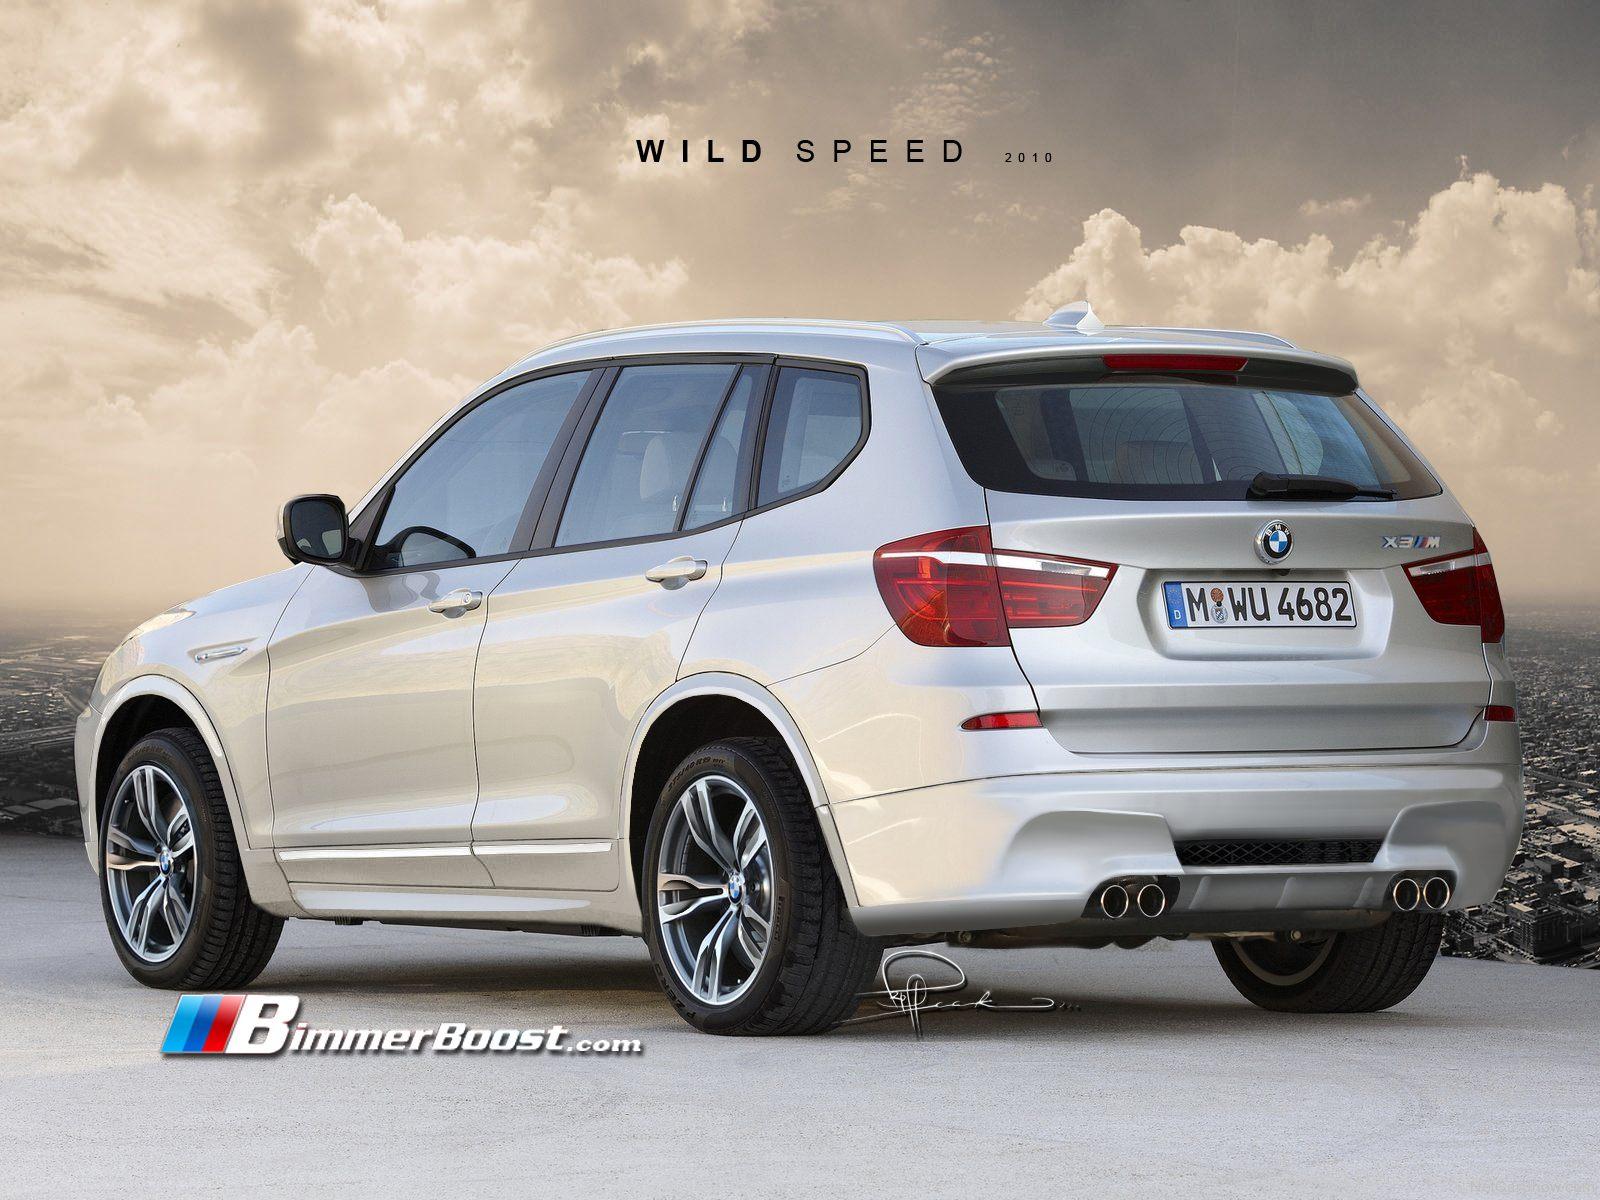 BMW X3 M F25 Rendering